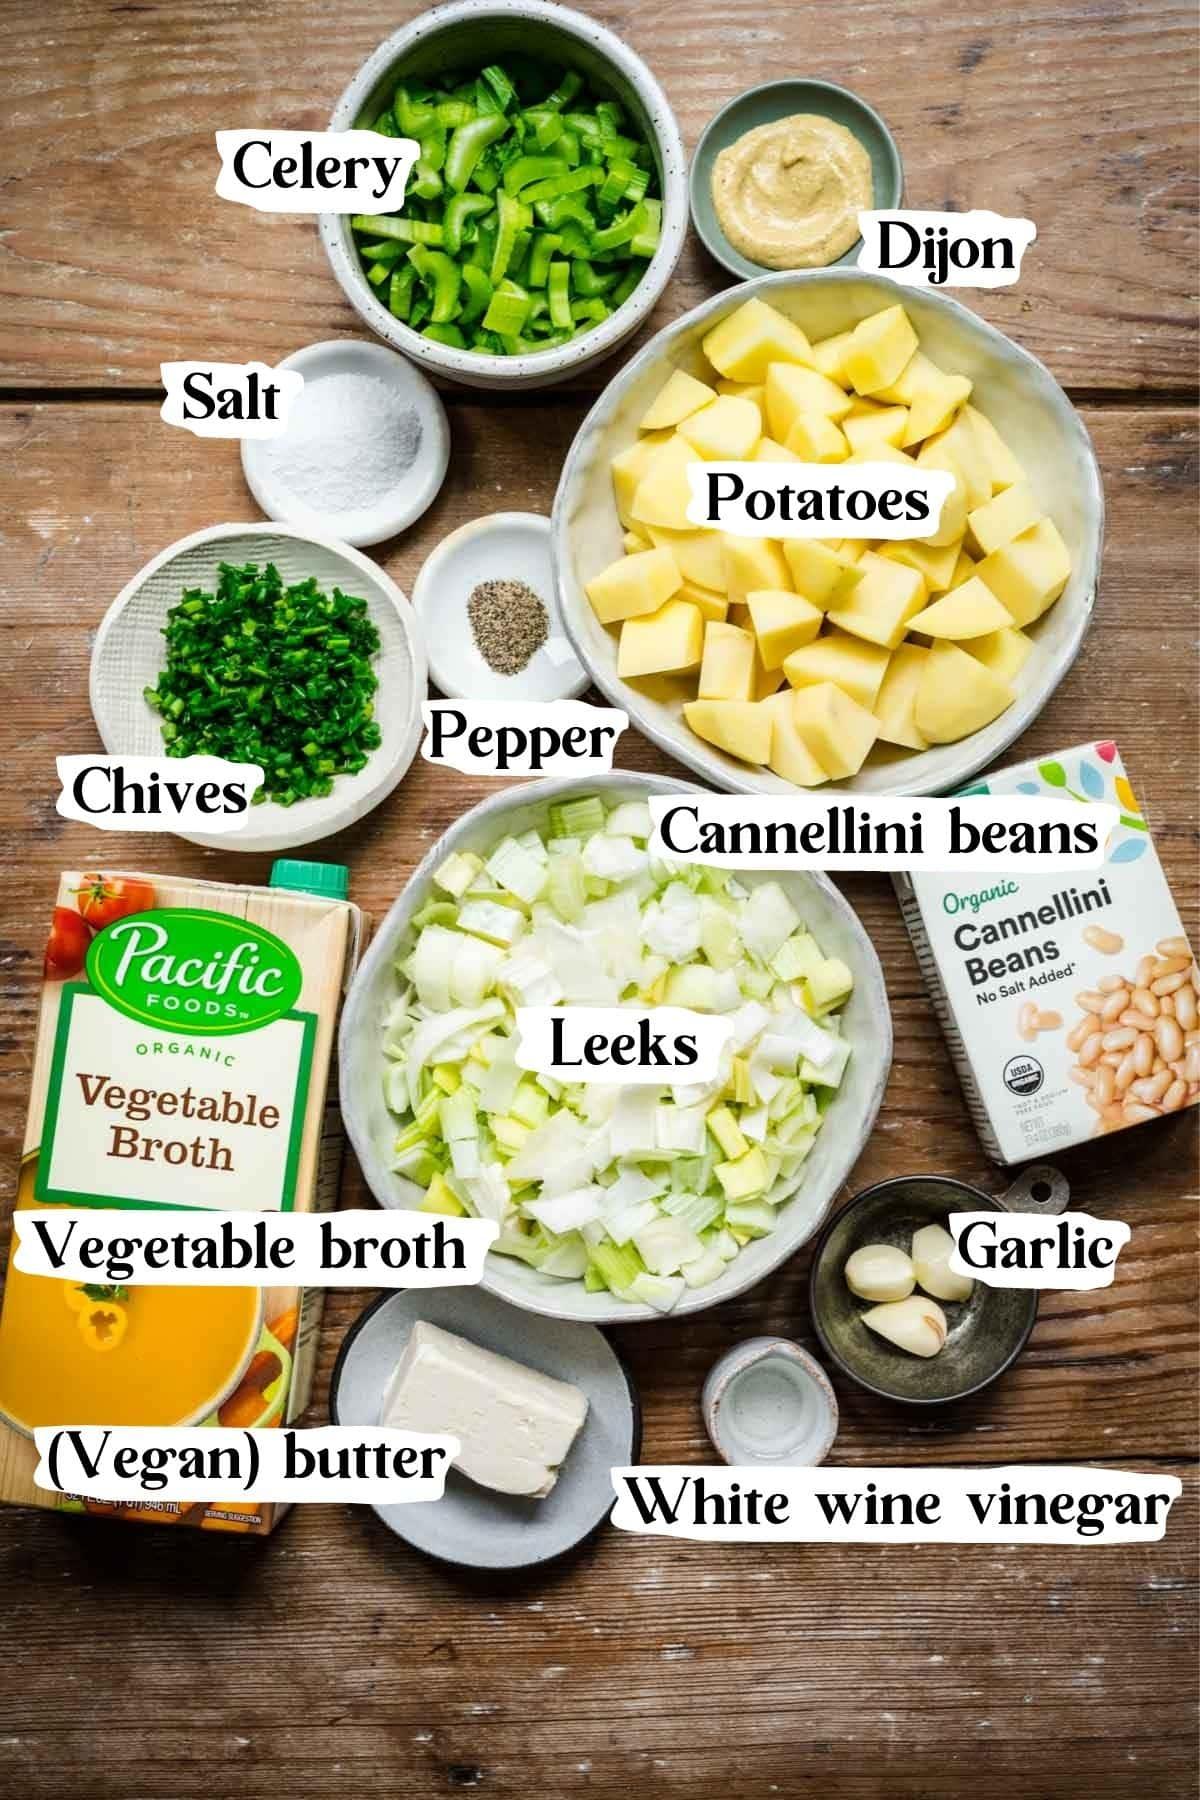 Overhead view of potato leek soup ingredients.